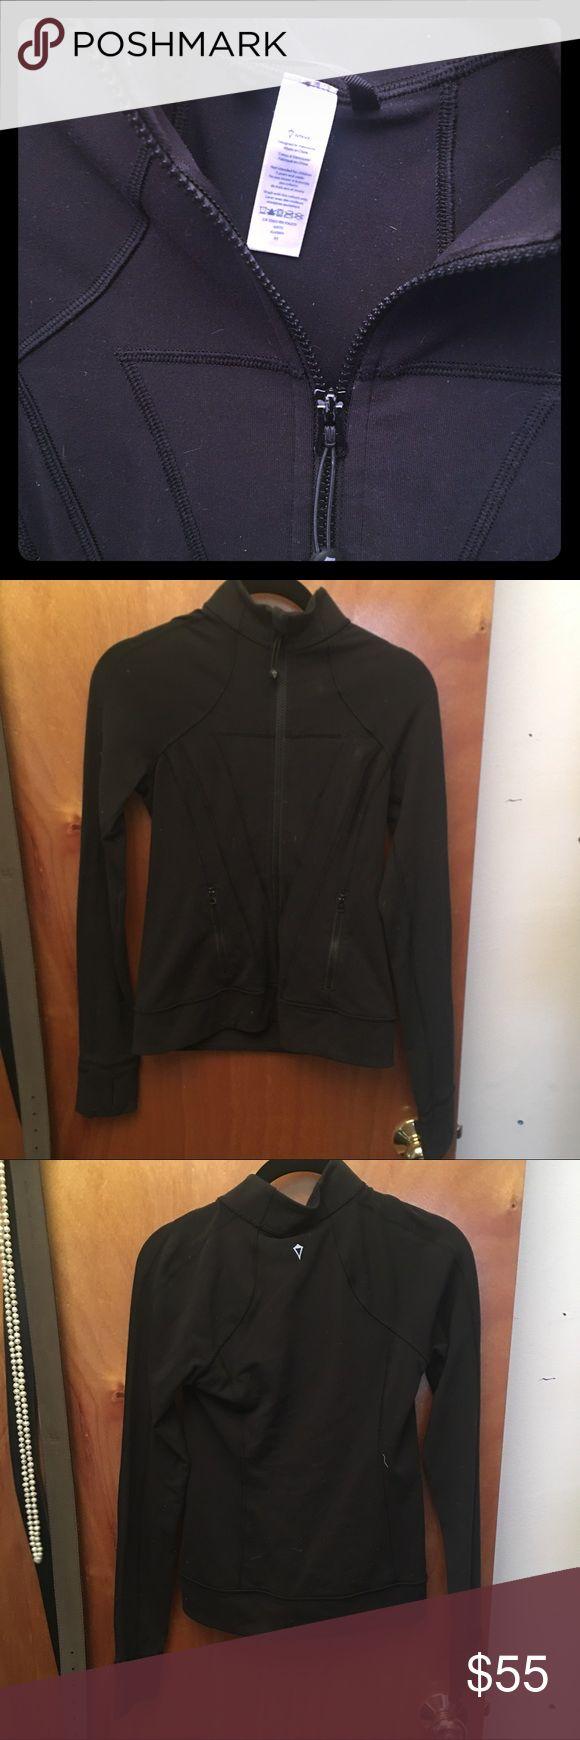 IVIVVA lululemon black zip up EUC! Great condition no flaws. Size 12 in IVIVVA fits me size 2-6 in lululemon lululemon athletica Tops Sweatshirts & Hoodies